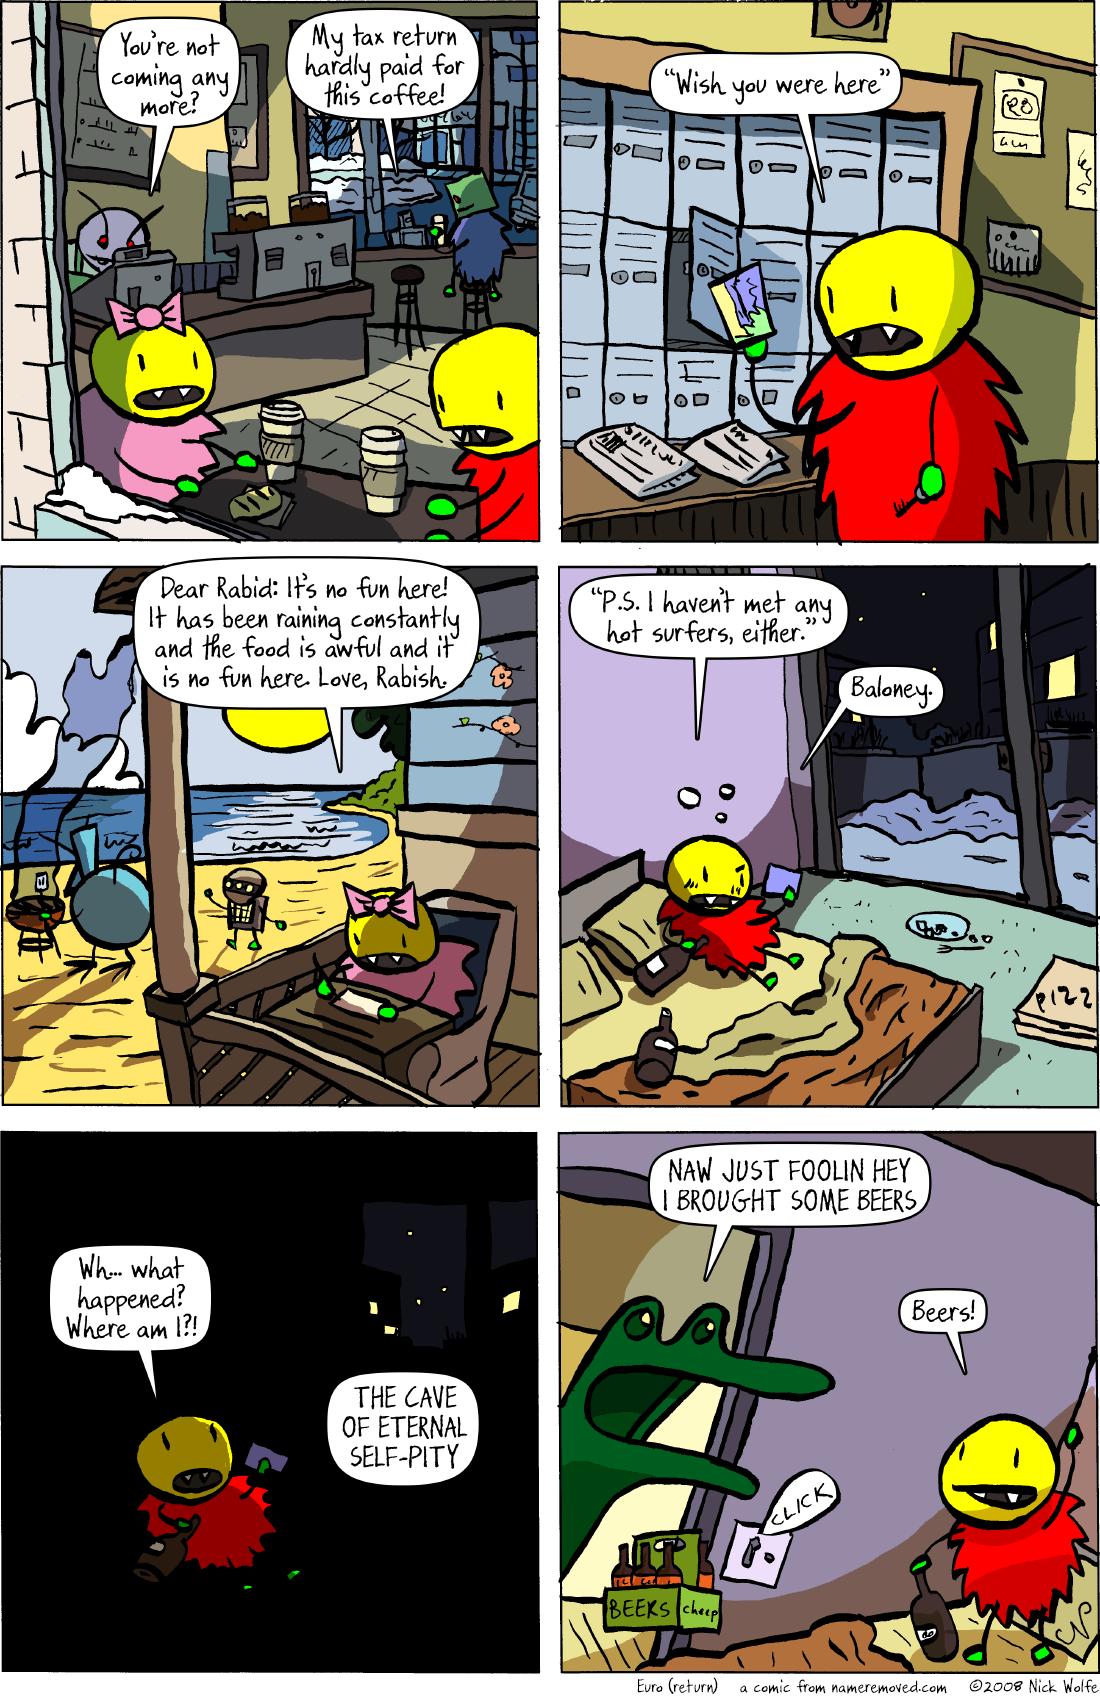 Euro (return)